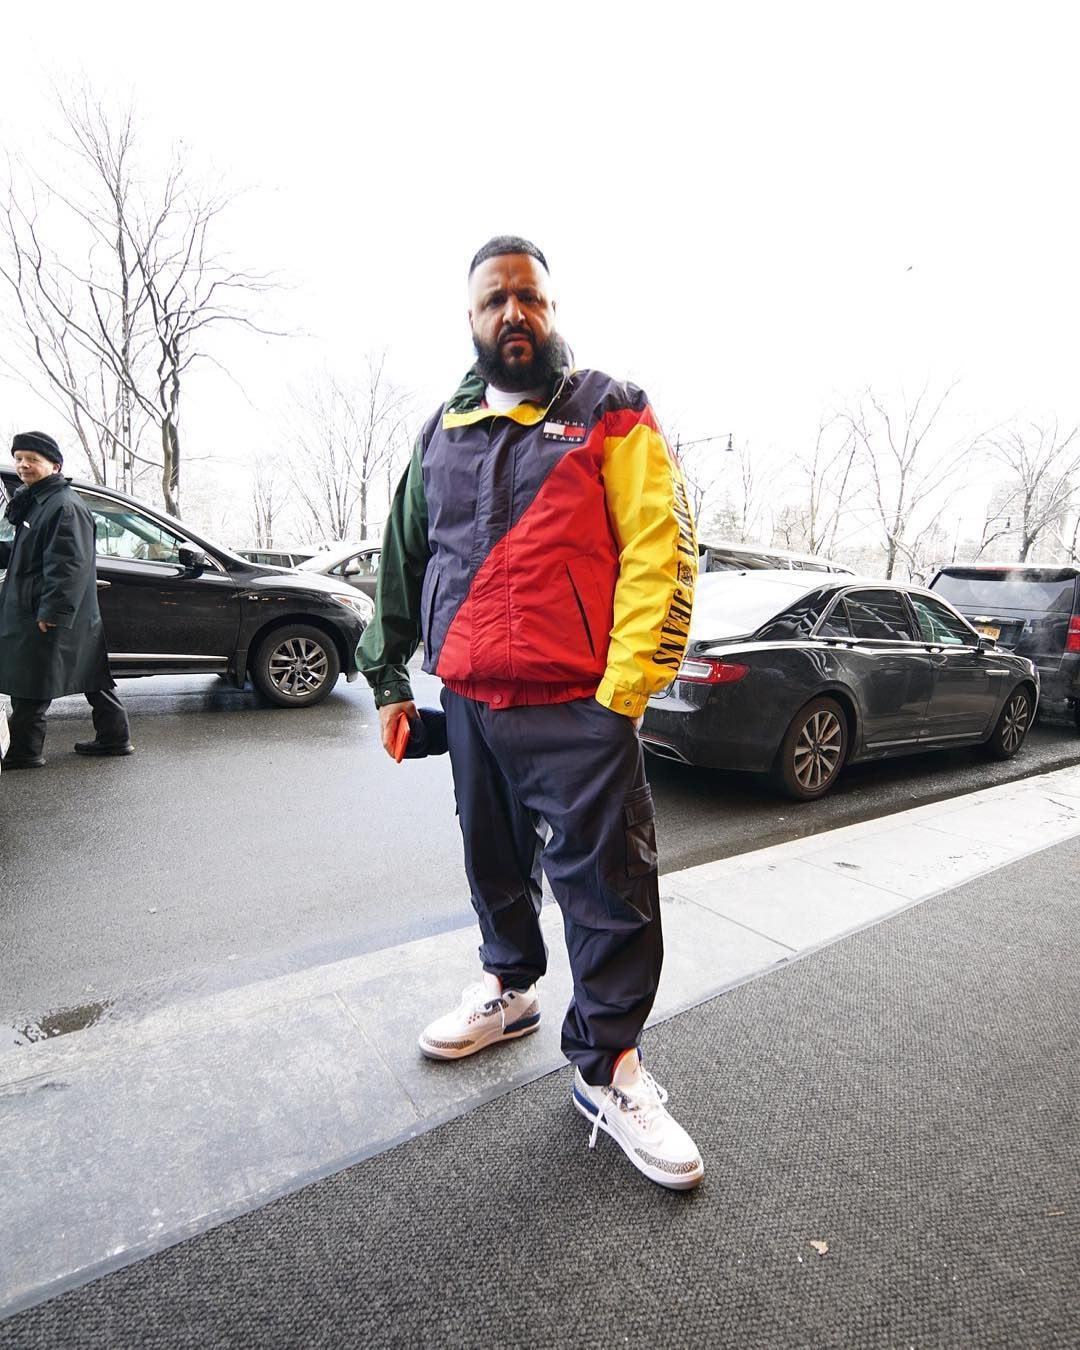 DJ Khaled wears a Tommy Hilfiger Jacket and Nike Air Jordan Sneakers  Menswear Rapper 9296b2bab